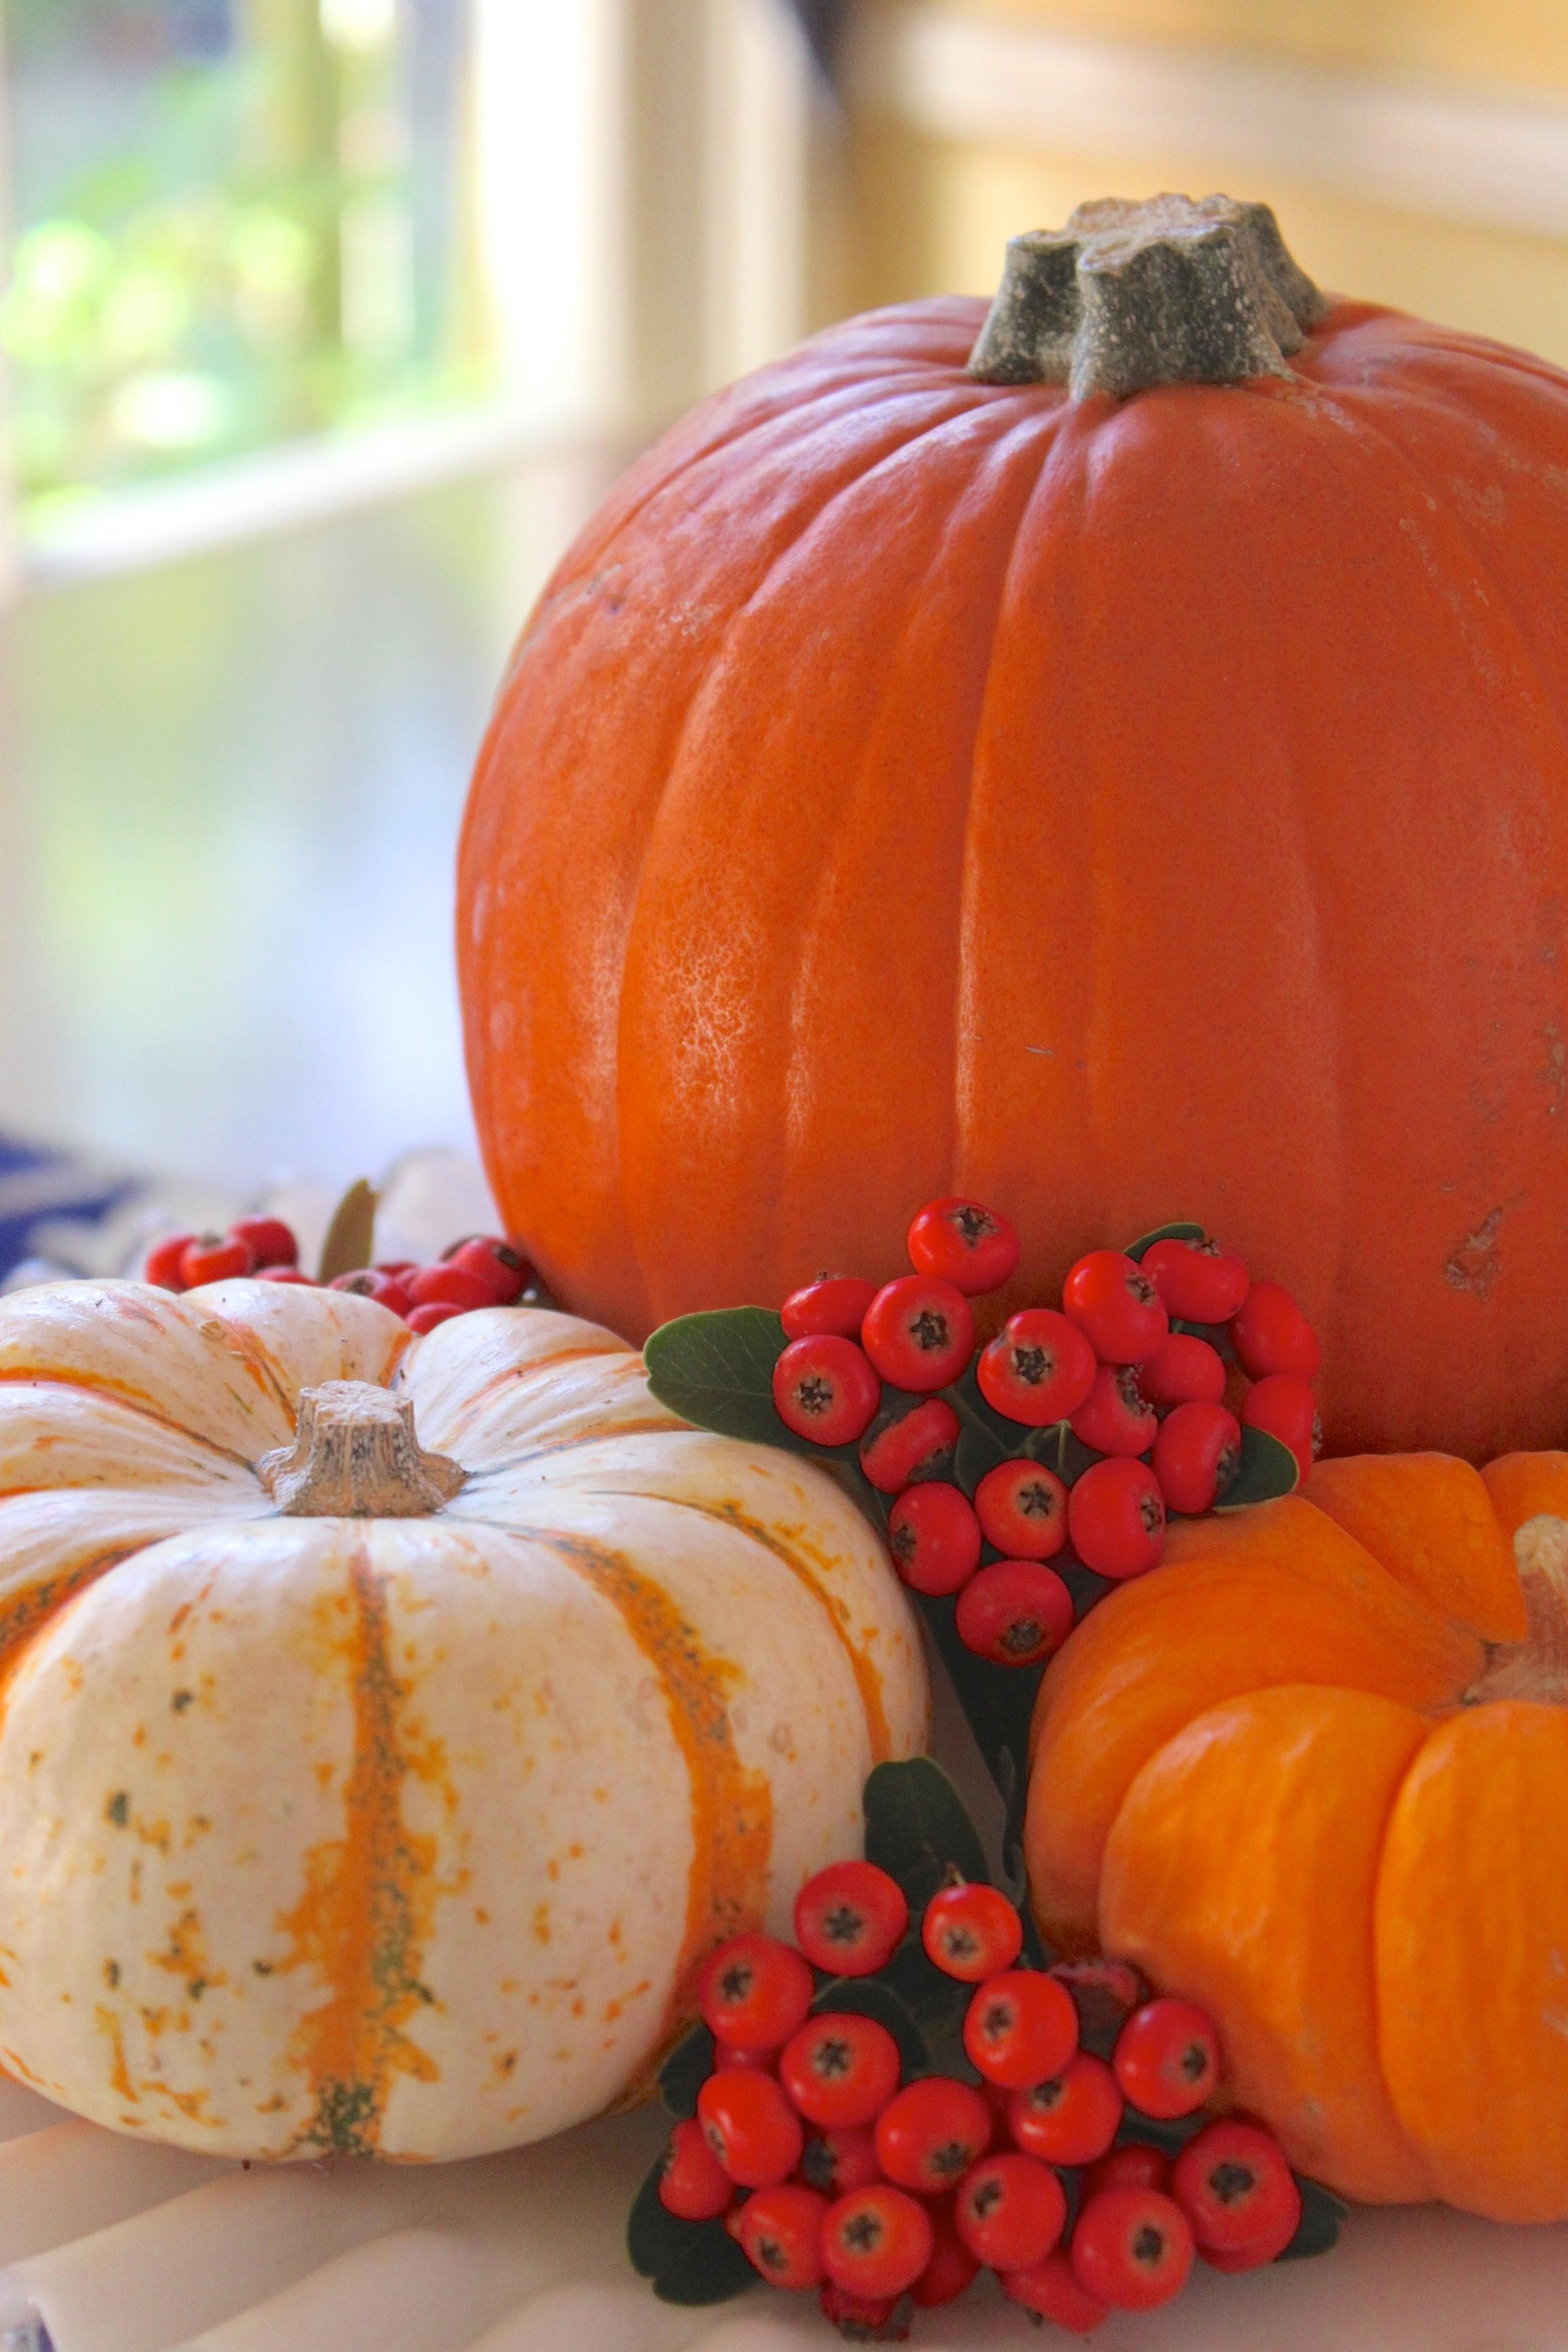 How to Prepare a Pumpkin (How to Cook, Bake or Roast a Pumpkin ...